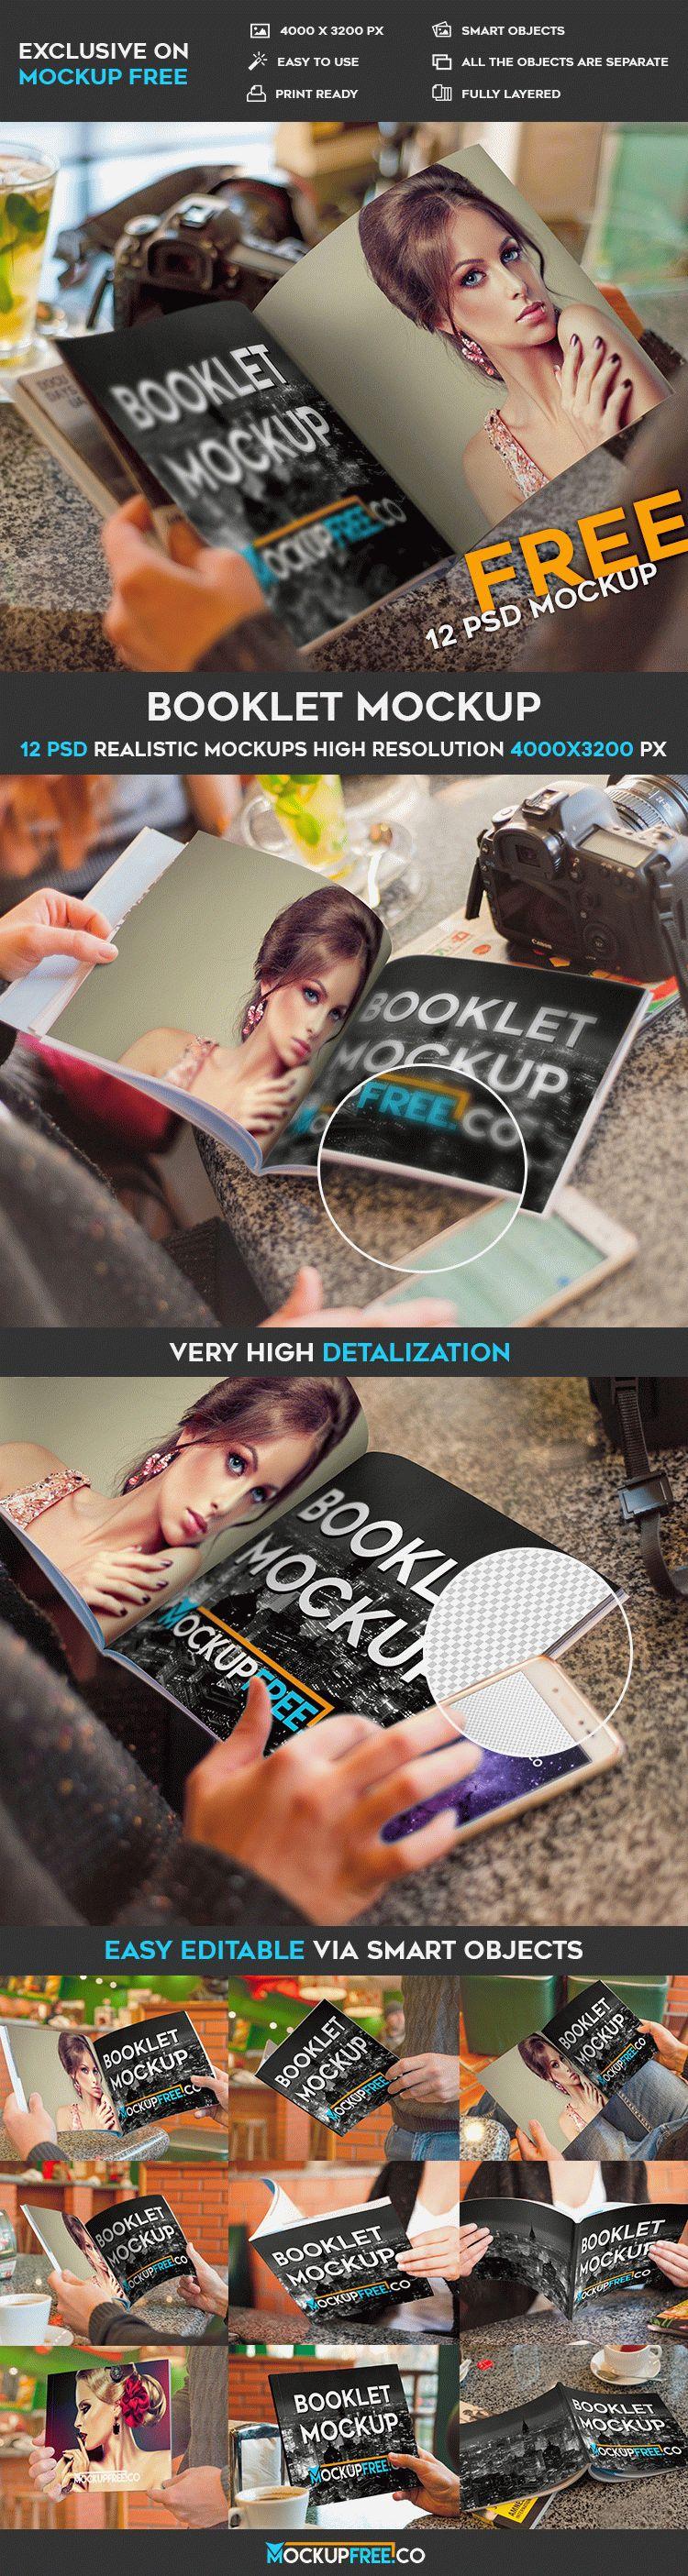 Booklet – 12 Free PSD Mockups